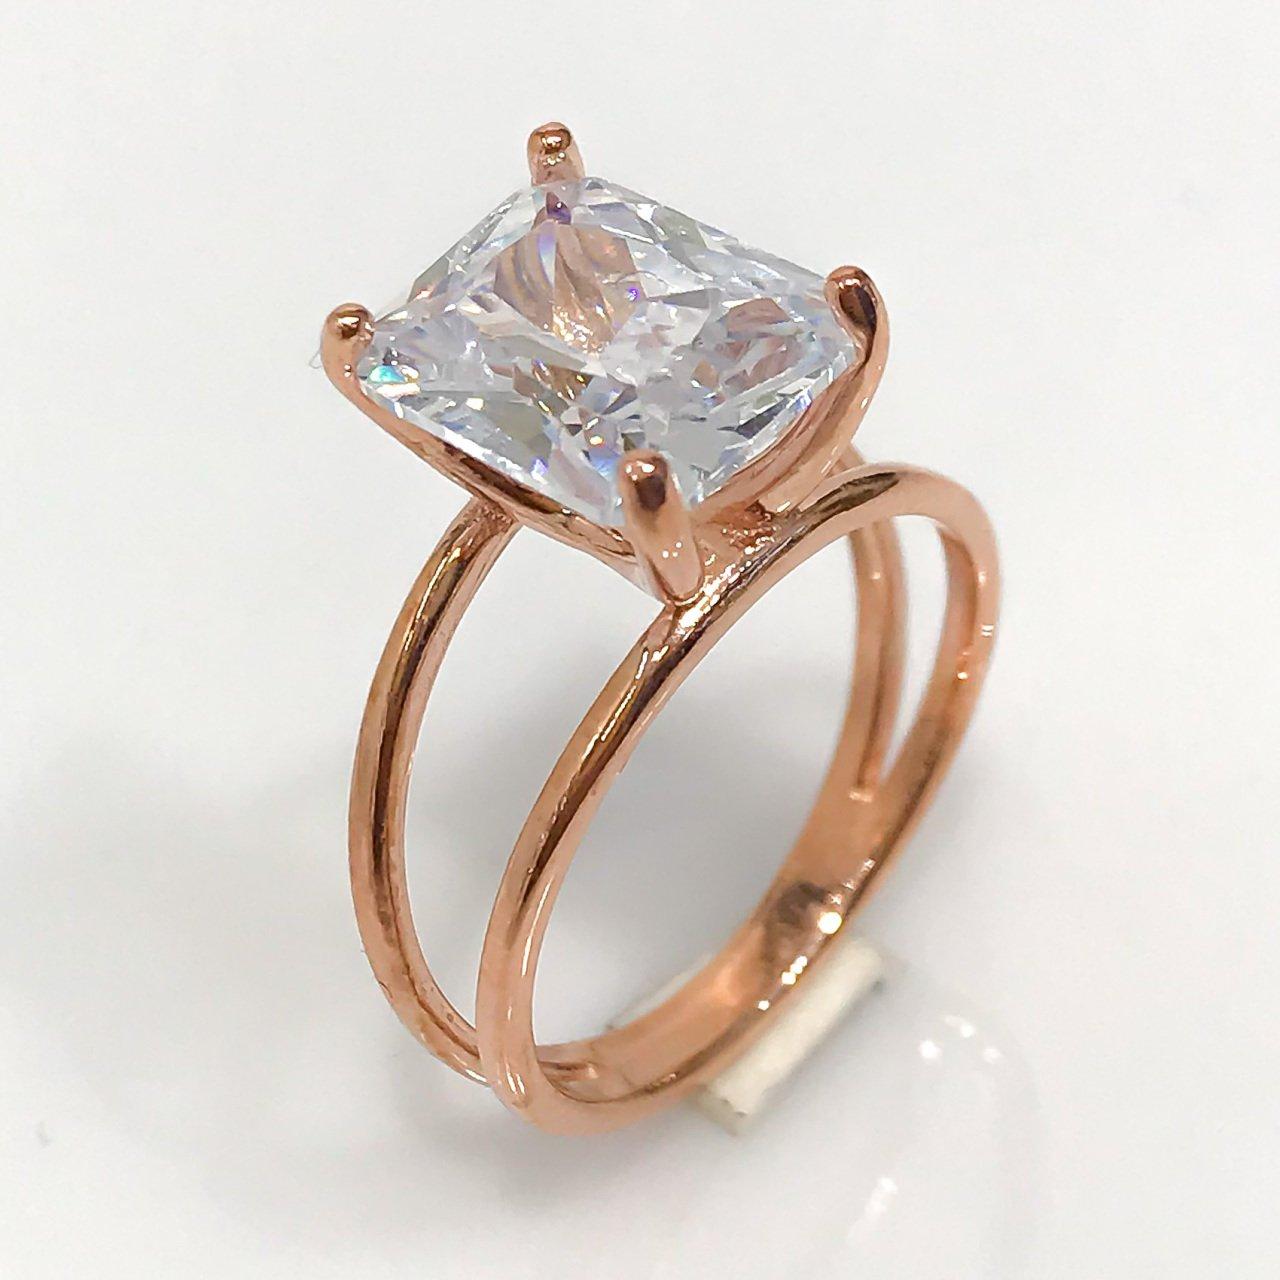 Baguette cristal diamante anillo de plata